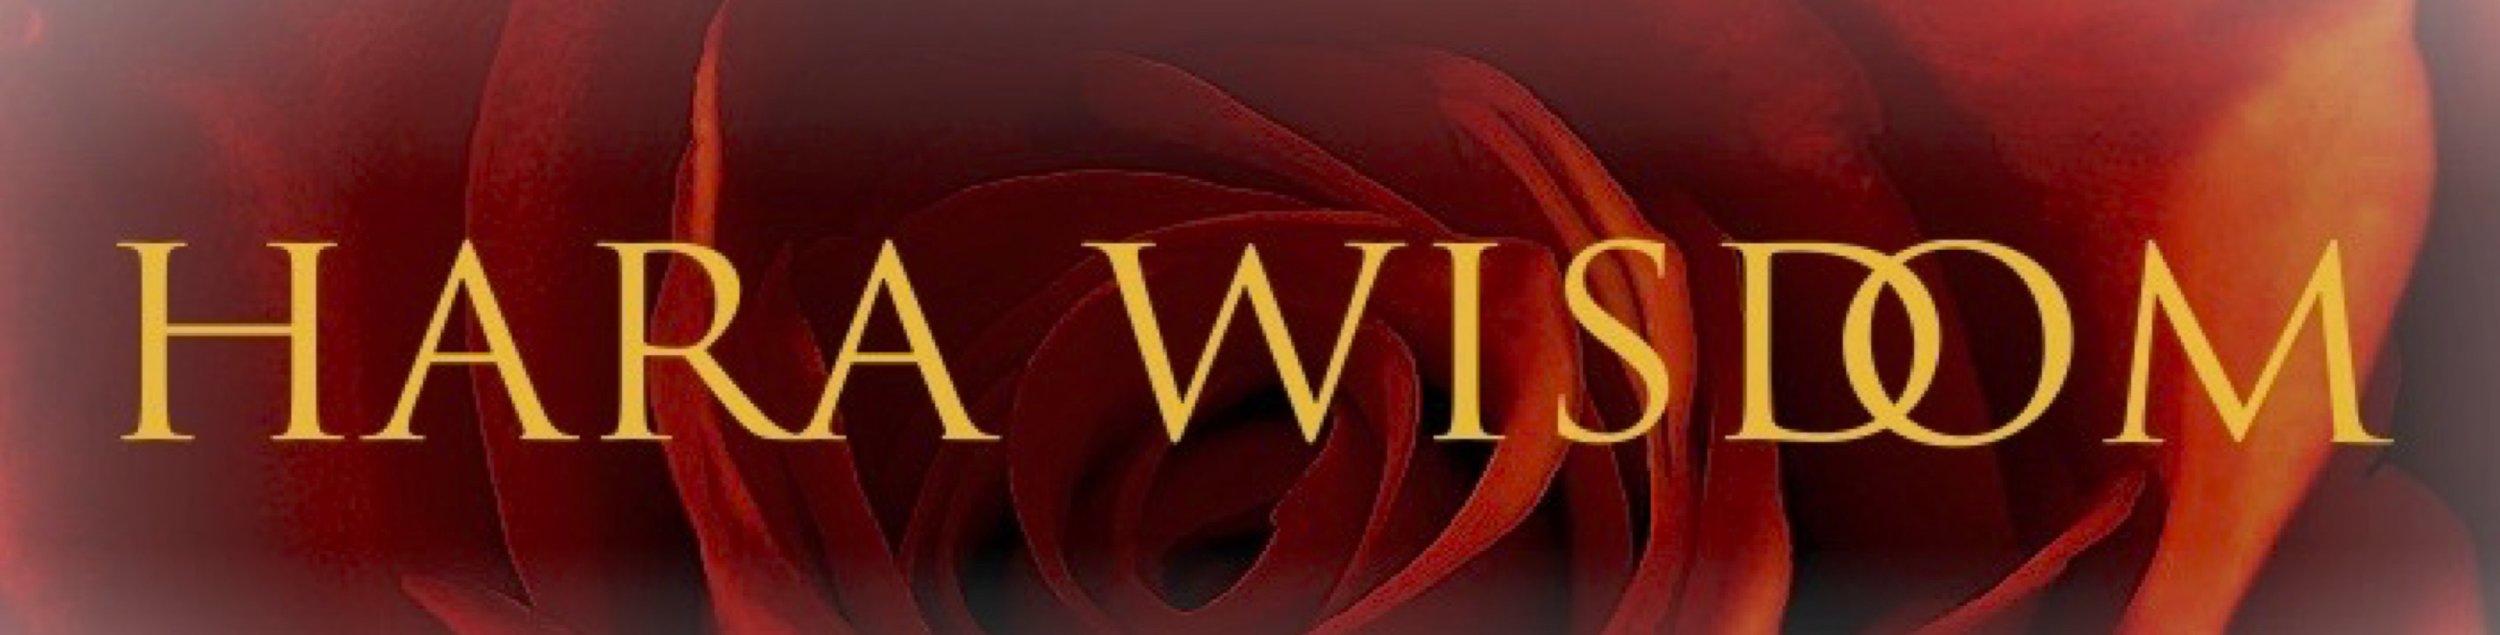 Hara Wisdom logo.jpg